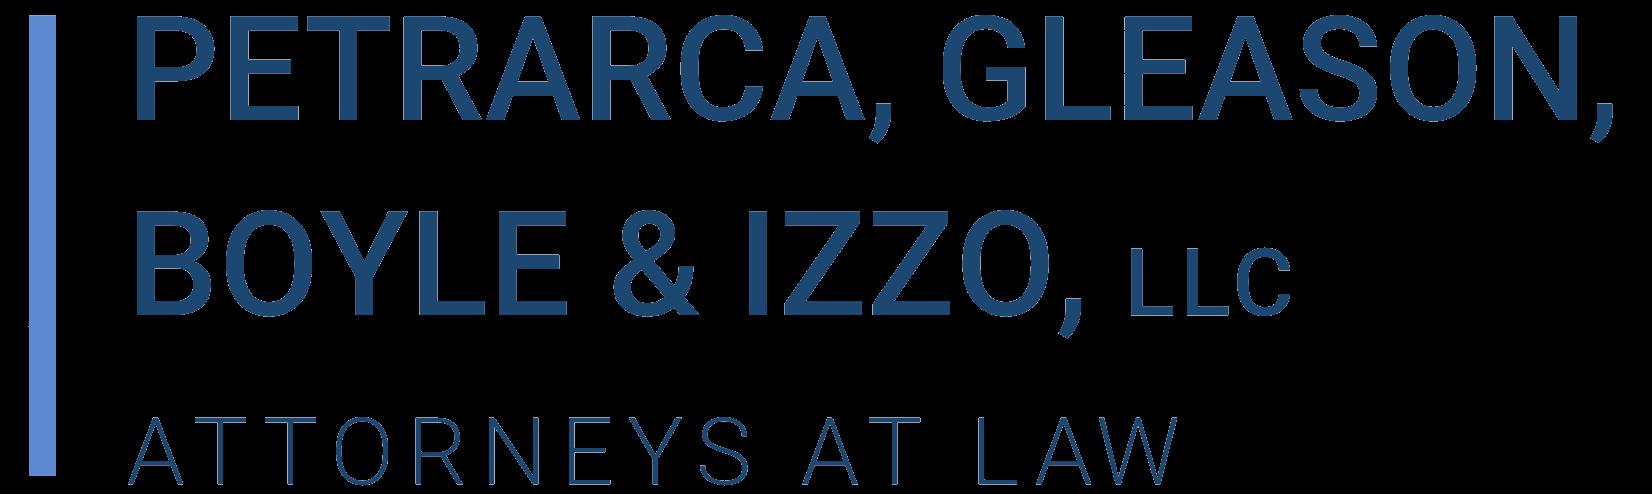 Petrarca, Gleason, Boyle & Izzo, LLC Attorneys At Law